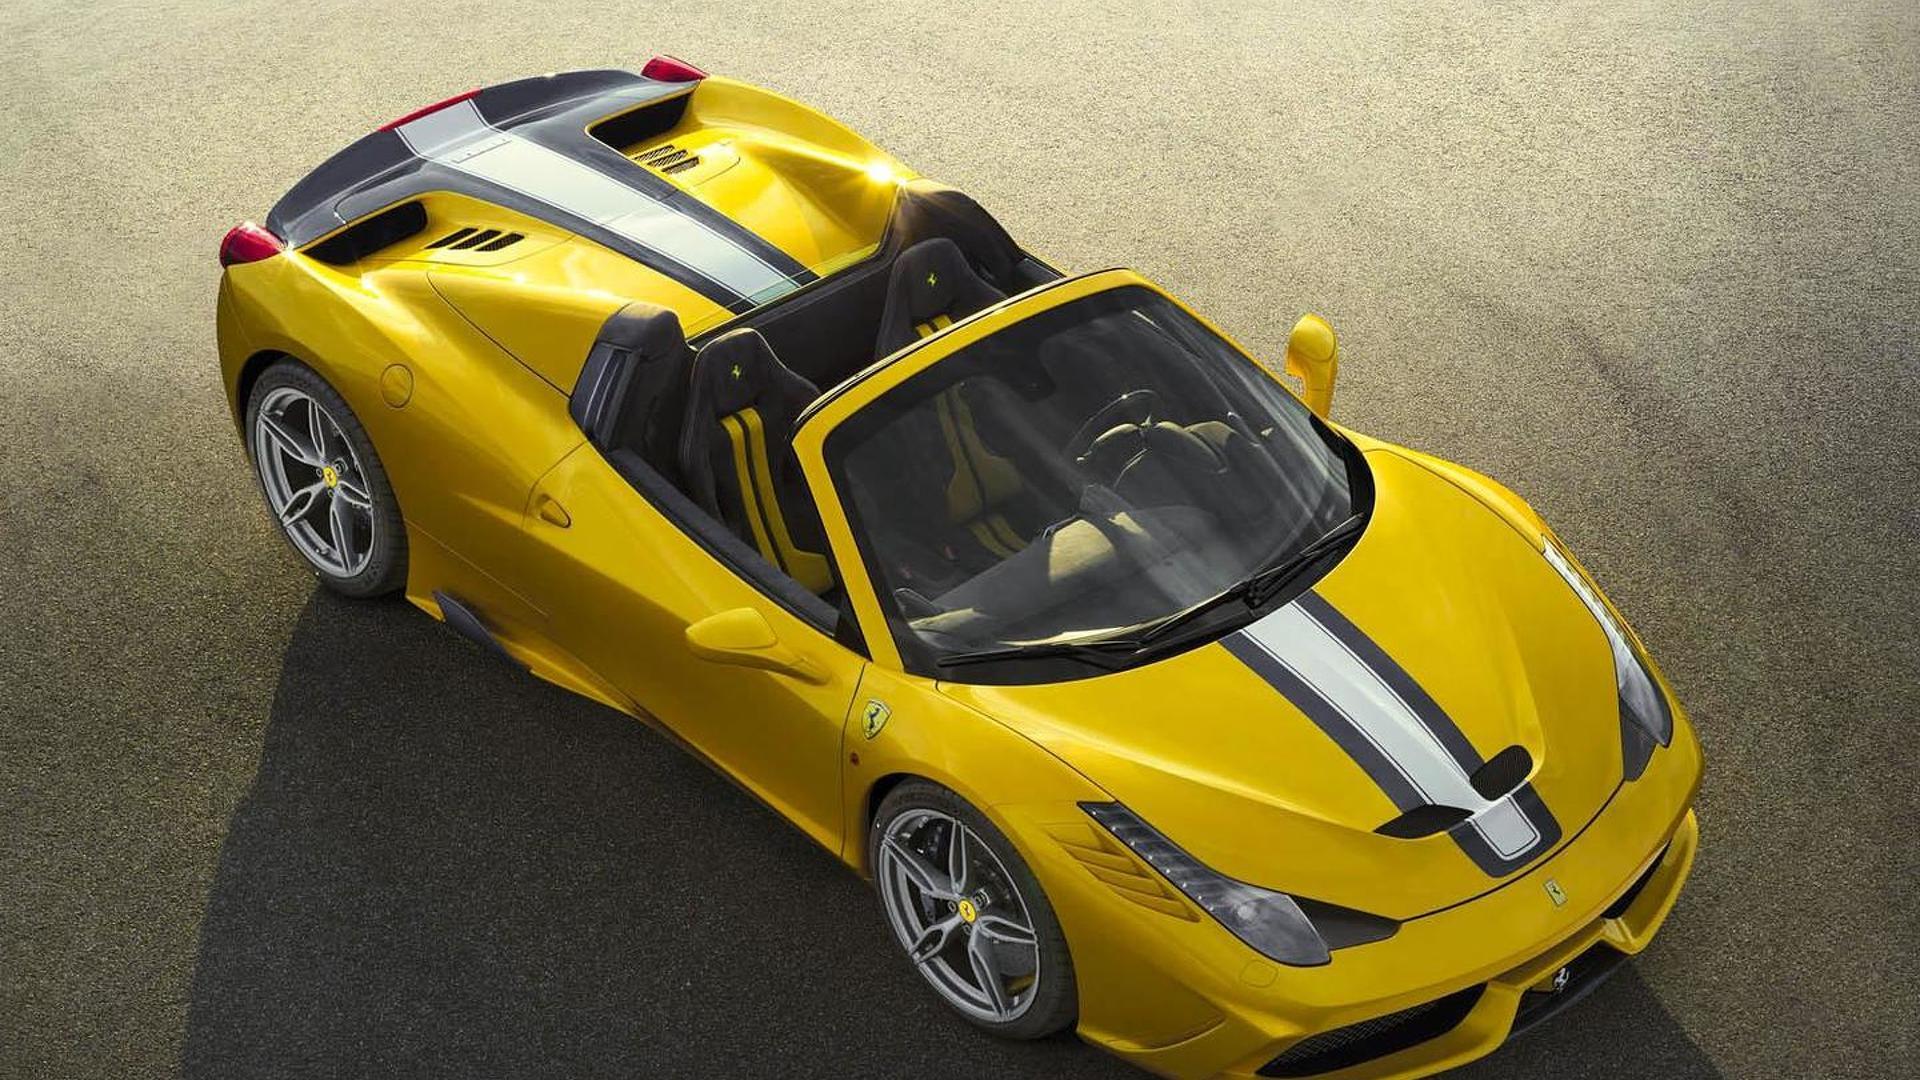 Sergio Marchionne says Ferrari is worth €12 billion, analysts beg to differ